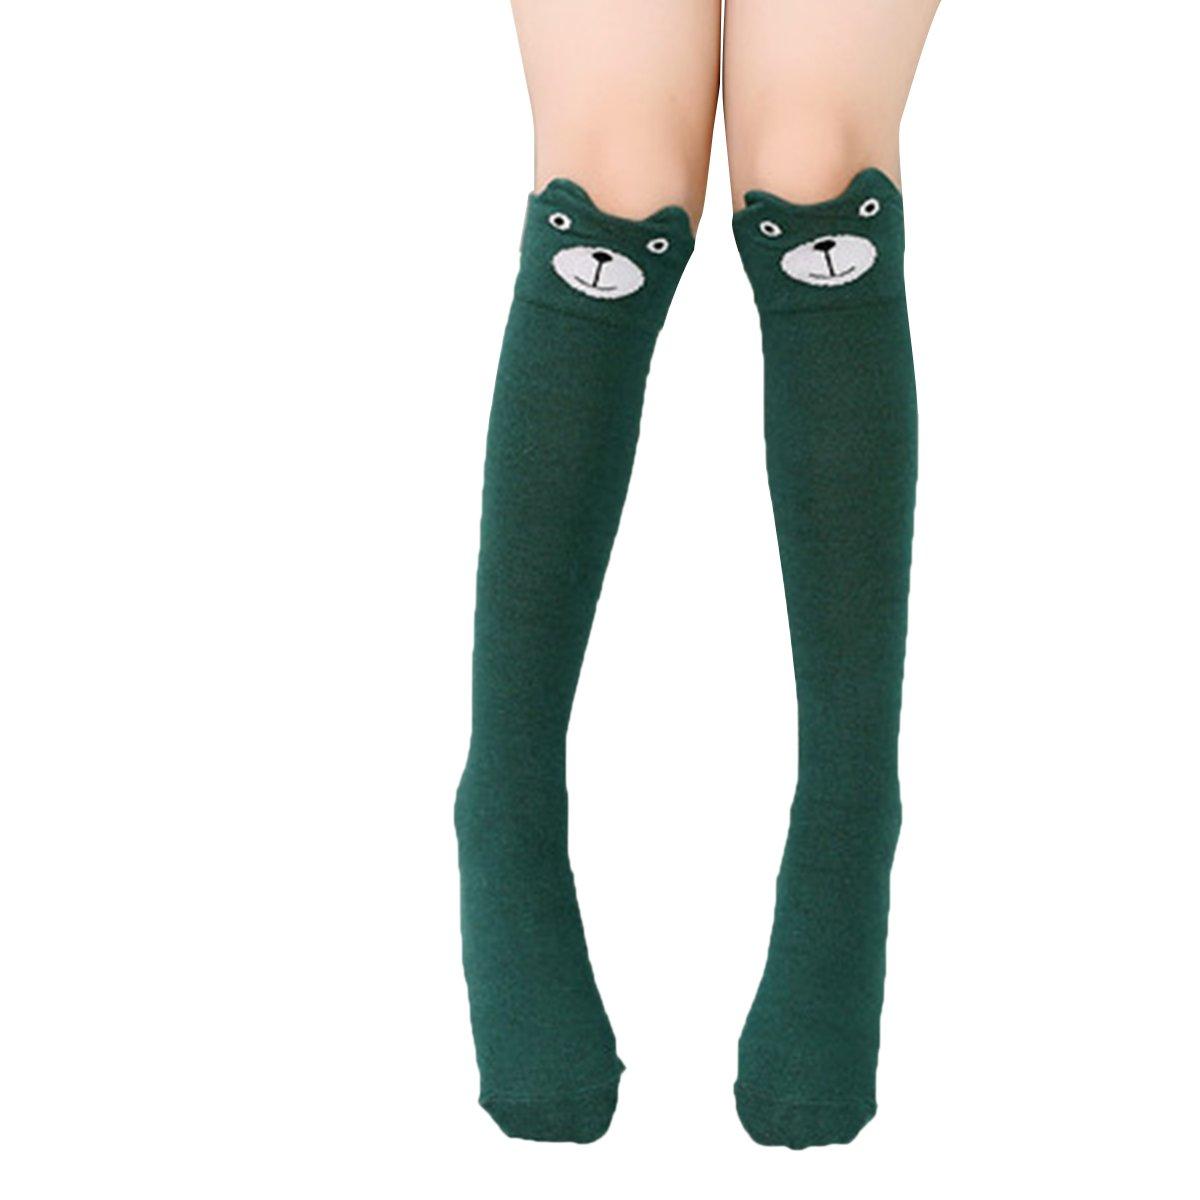 Butterme Baby Girls Cute Cartoon Animal Cat Bear Fox Cotton Socks Over Calf Knee High Socks Stockings for 3-10 Years Old Kids ZUMUii